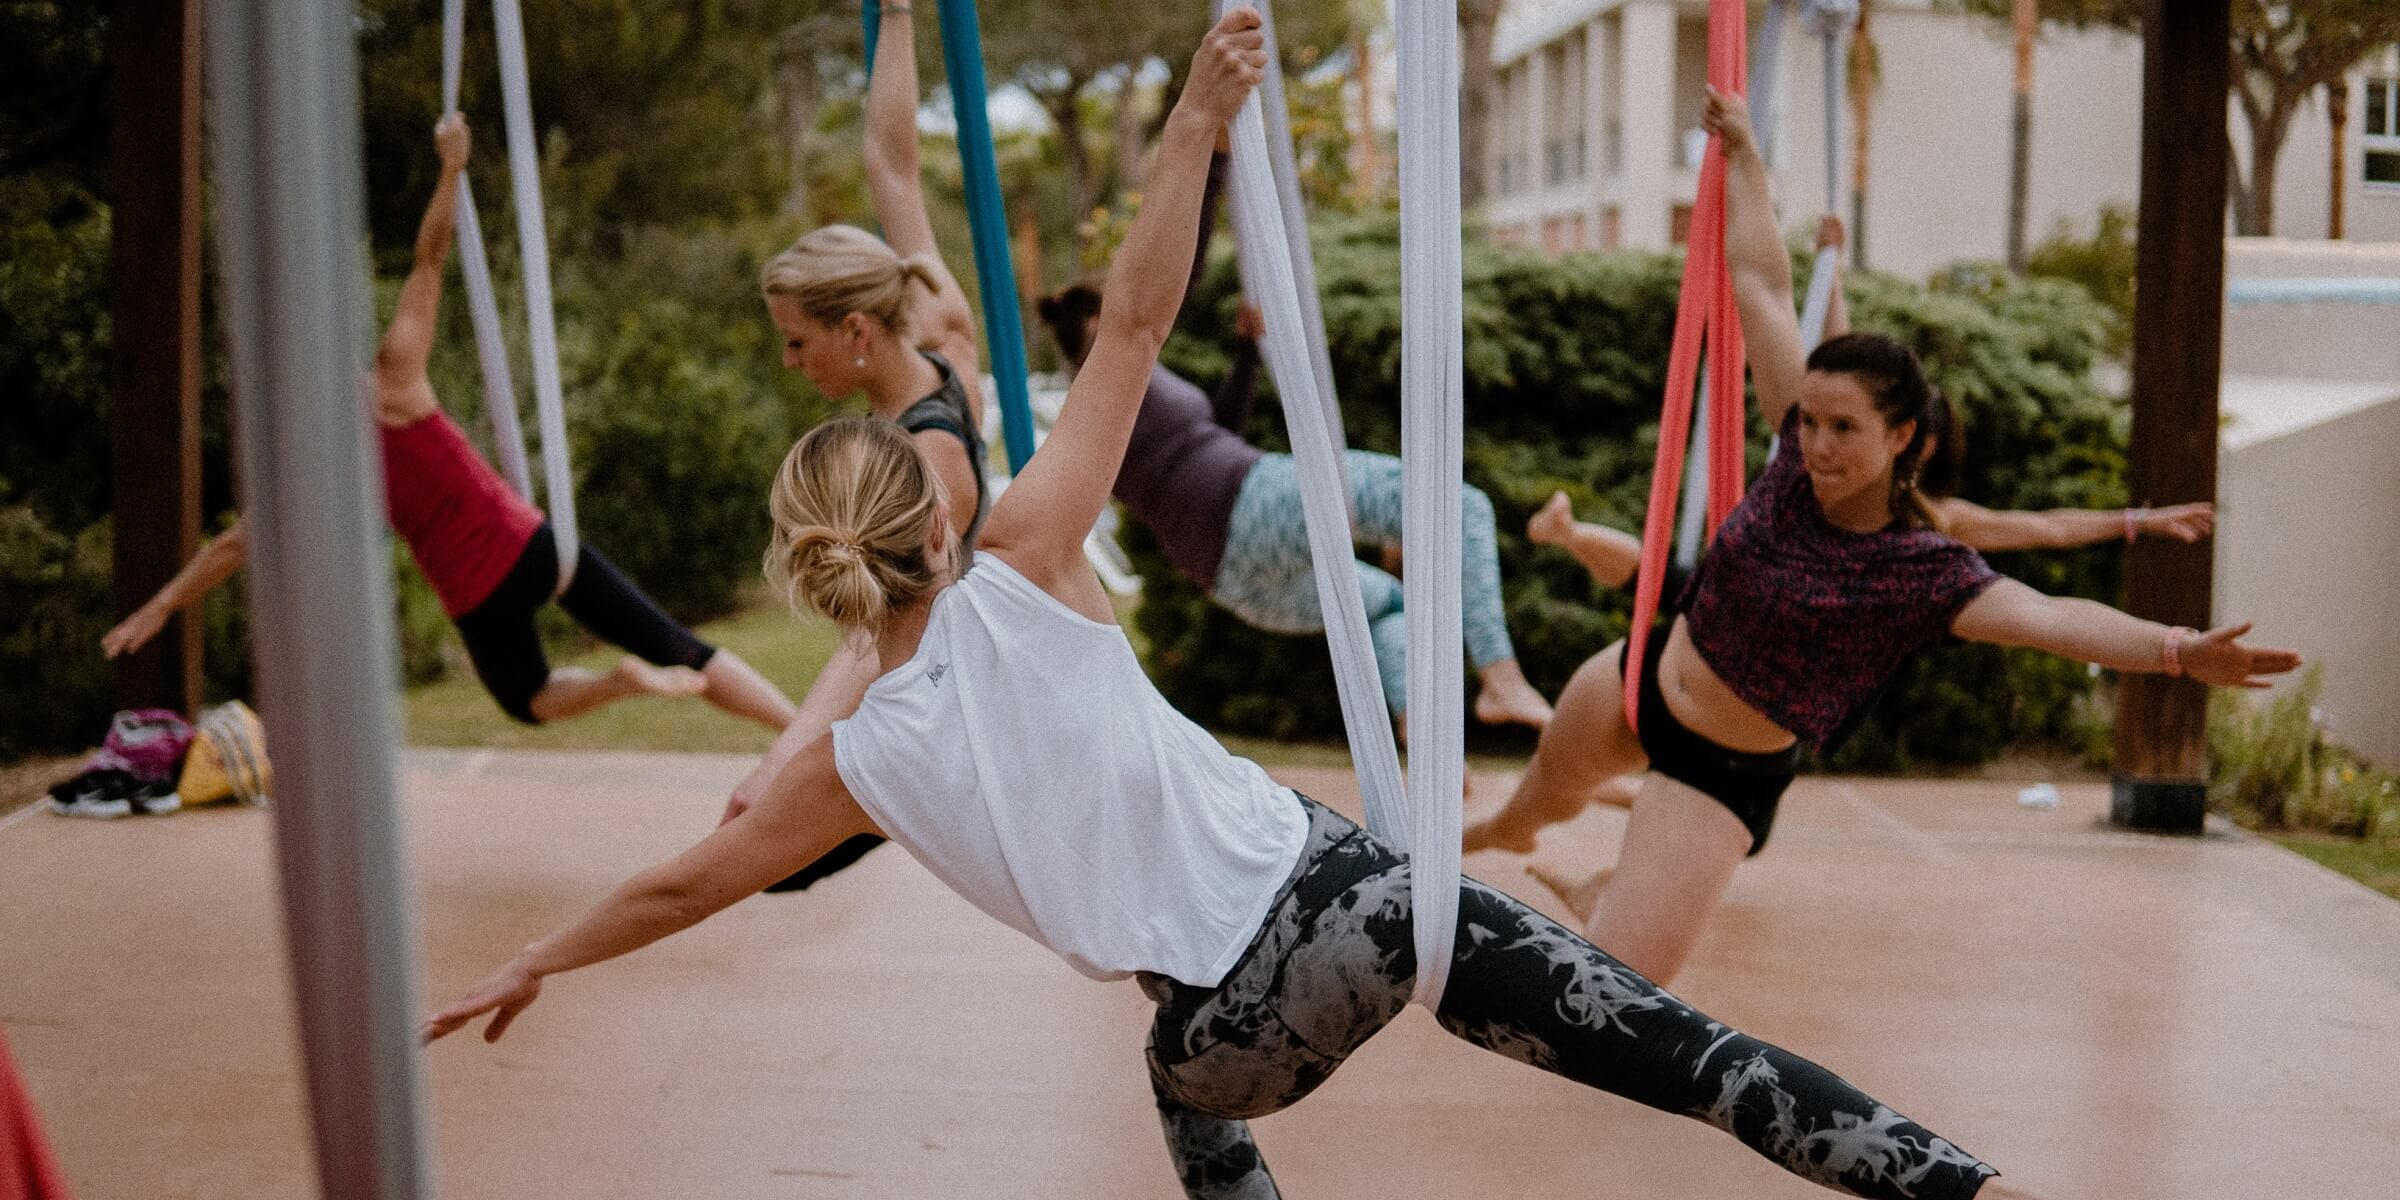 Women's Health Camp - Pilates